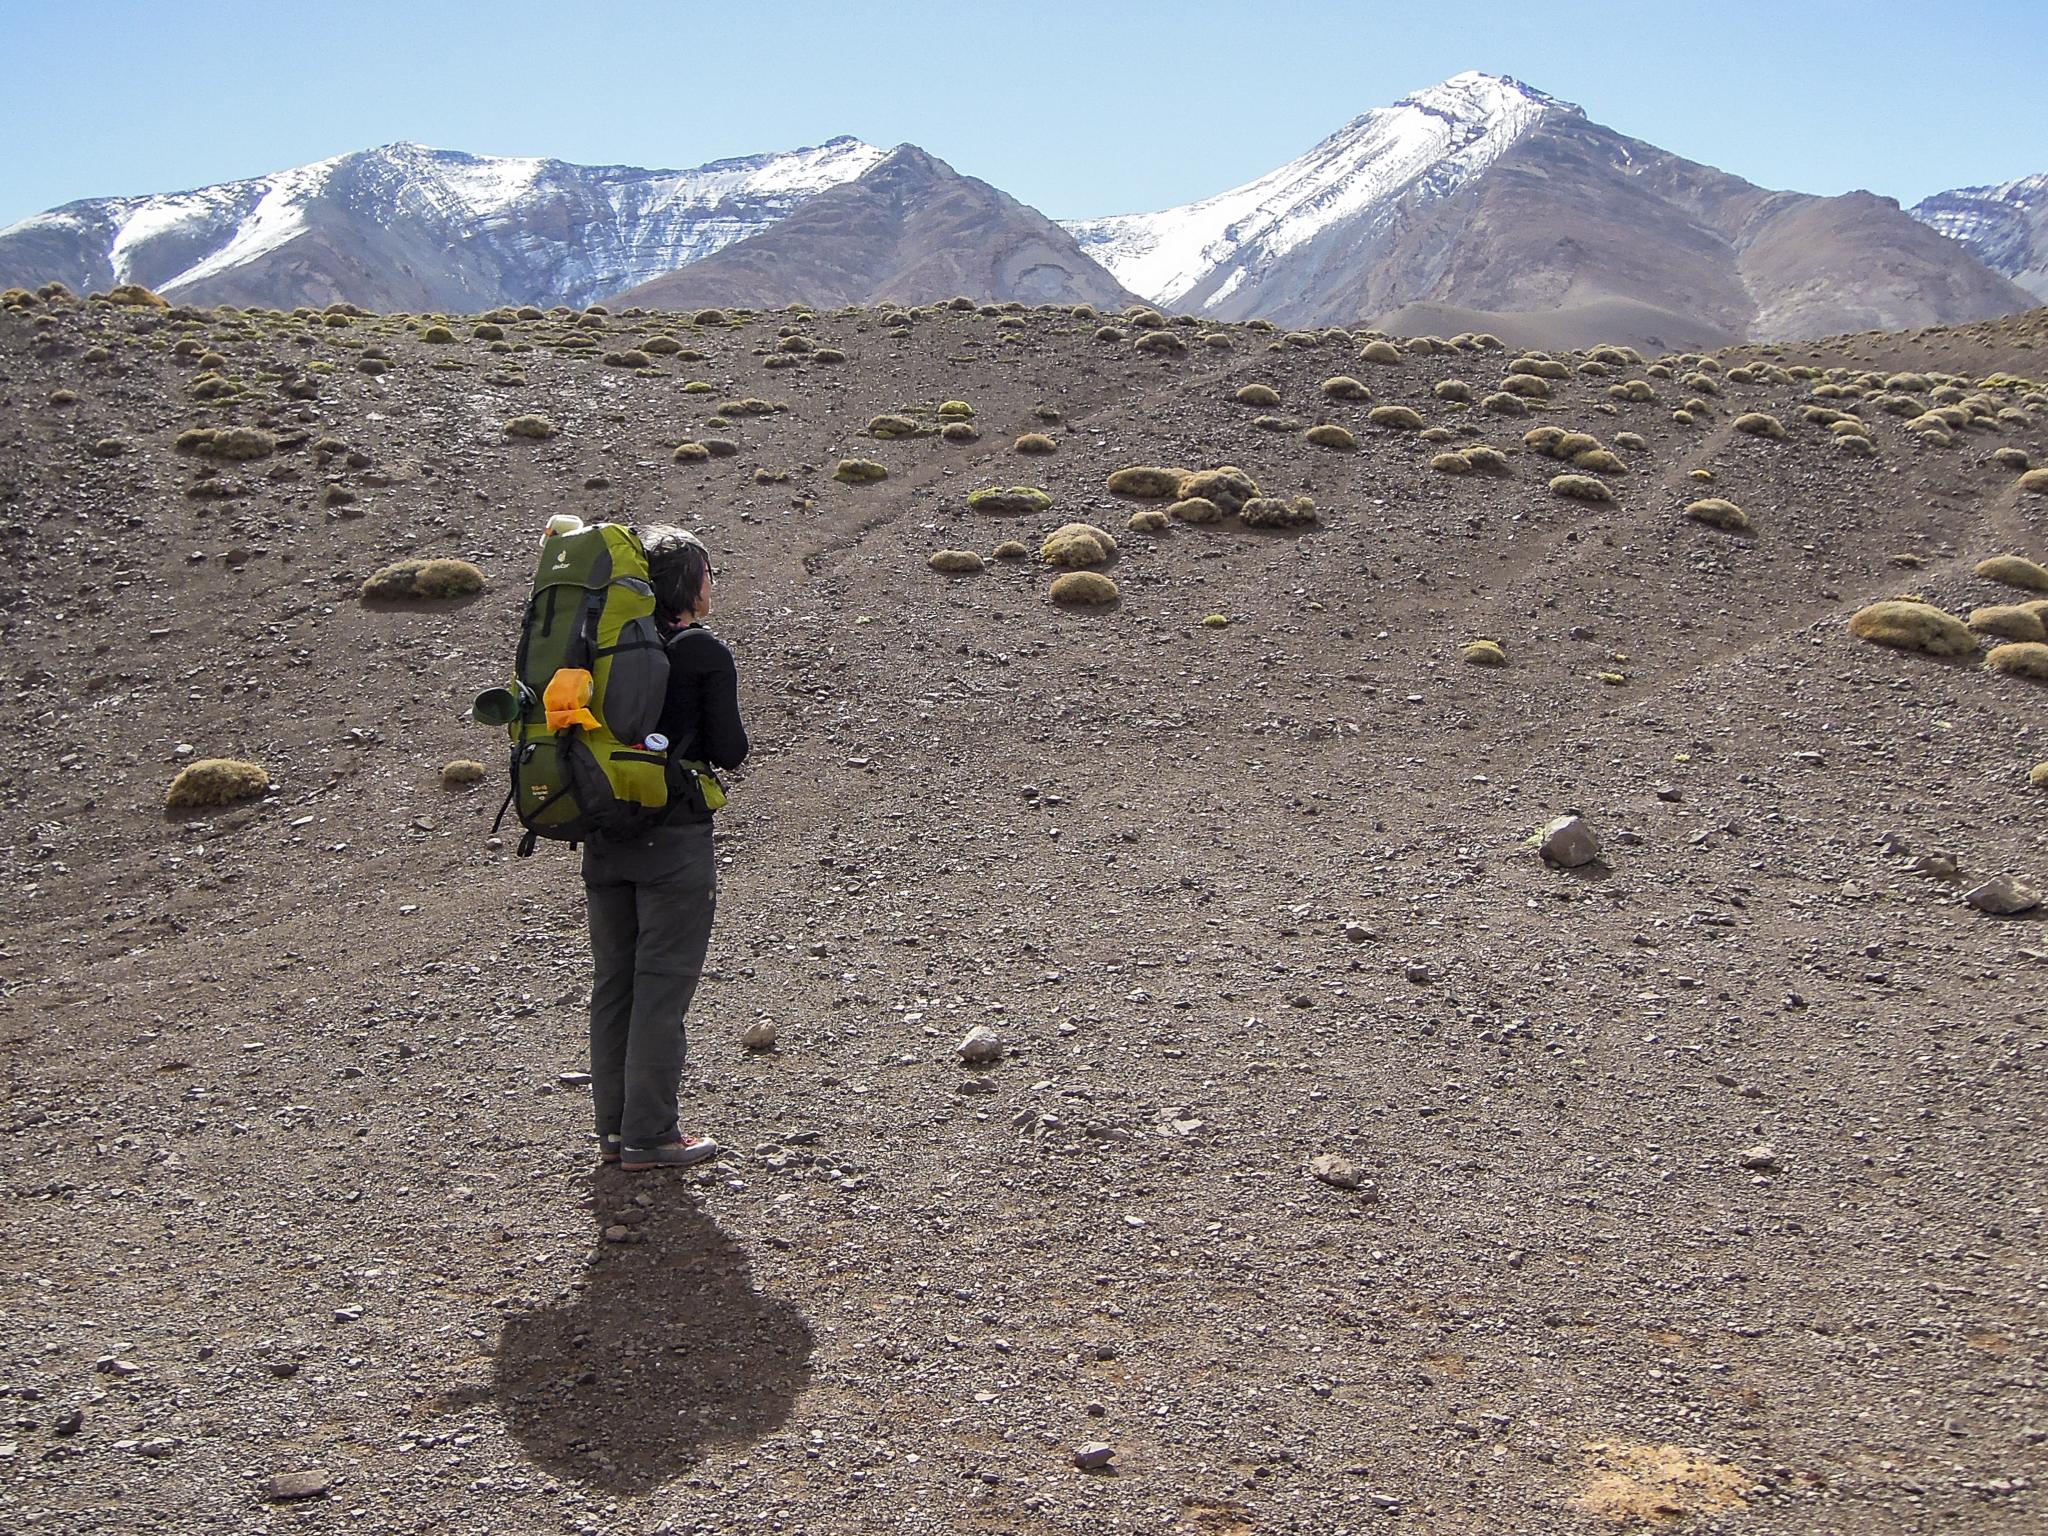 Forschungs-Sabbatical organic17 Hoher Atlas Marokko Trekking